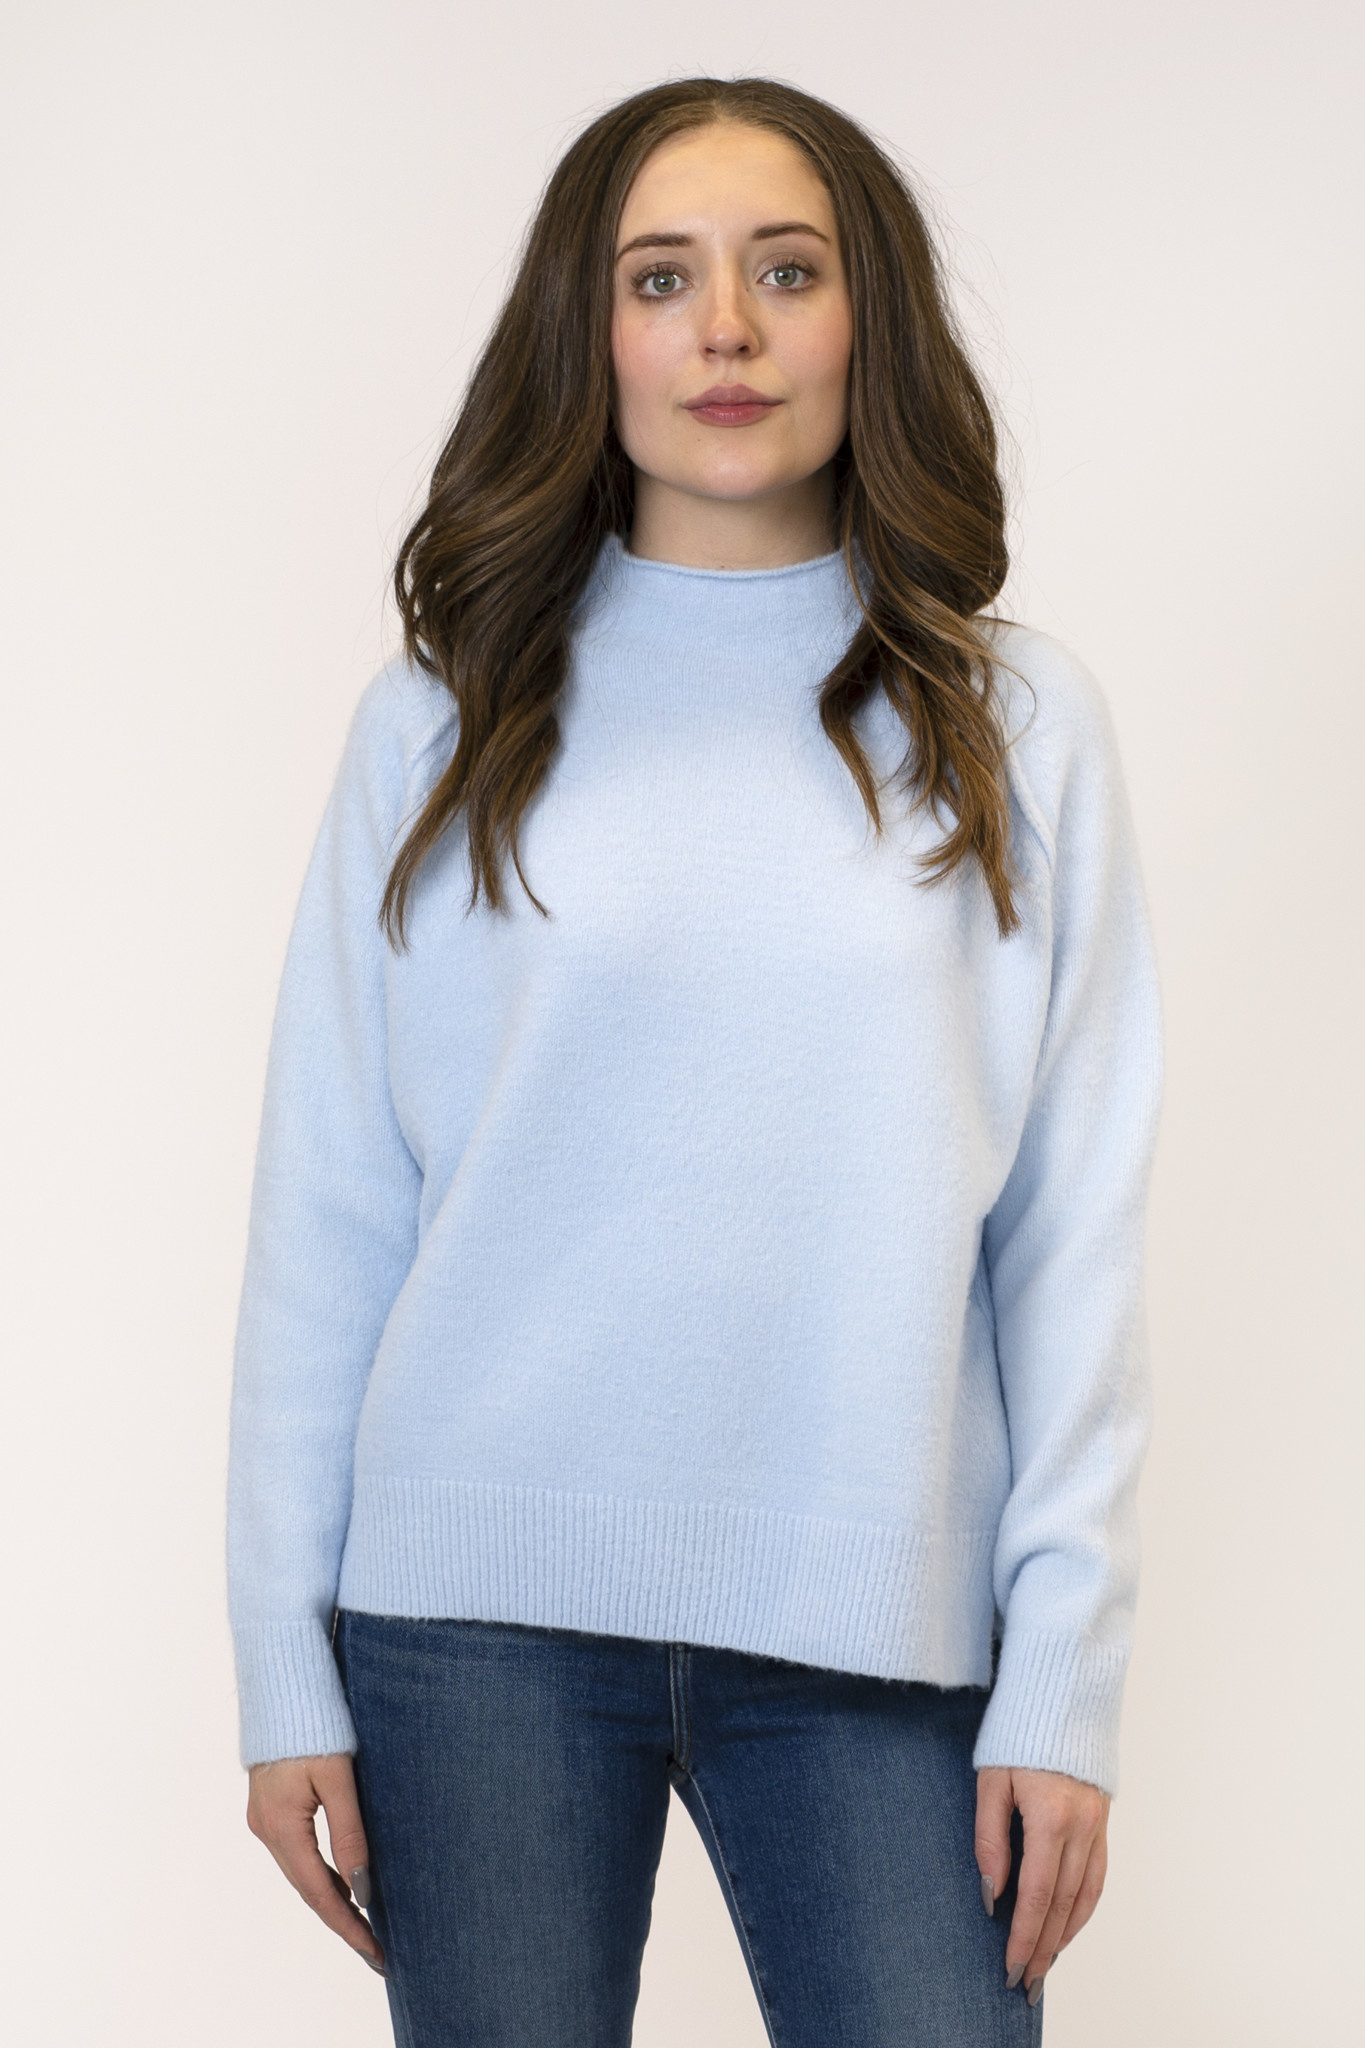 Lyla Luxe Sam Mockneck Raised Seam Sweater Grace The Boutique Grace The Boutique